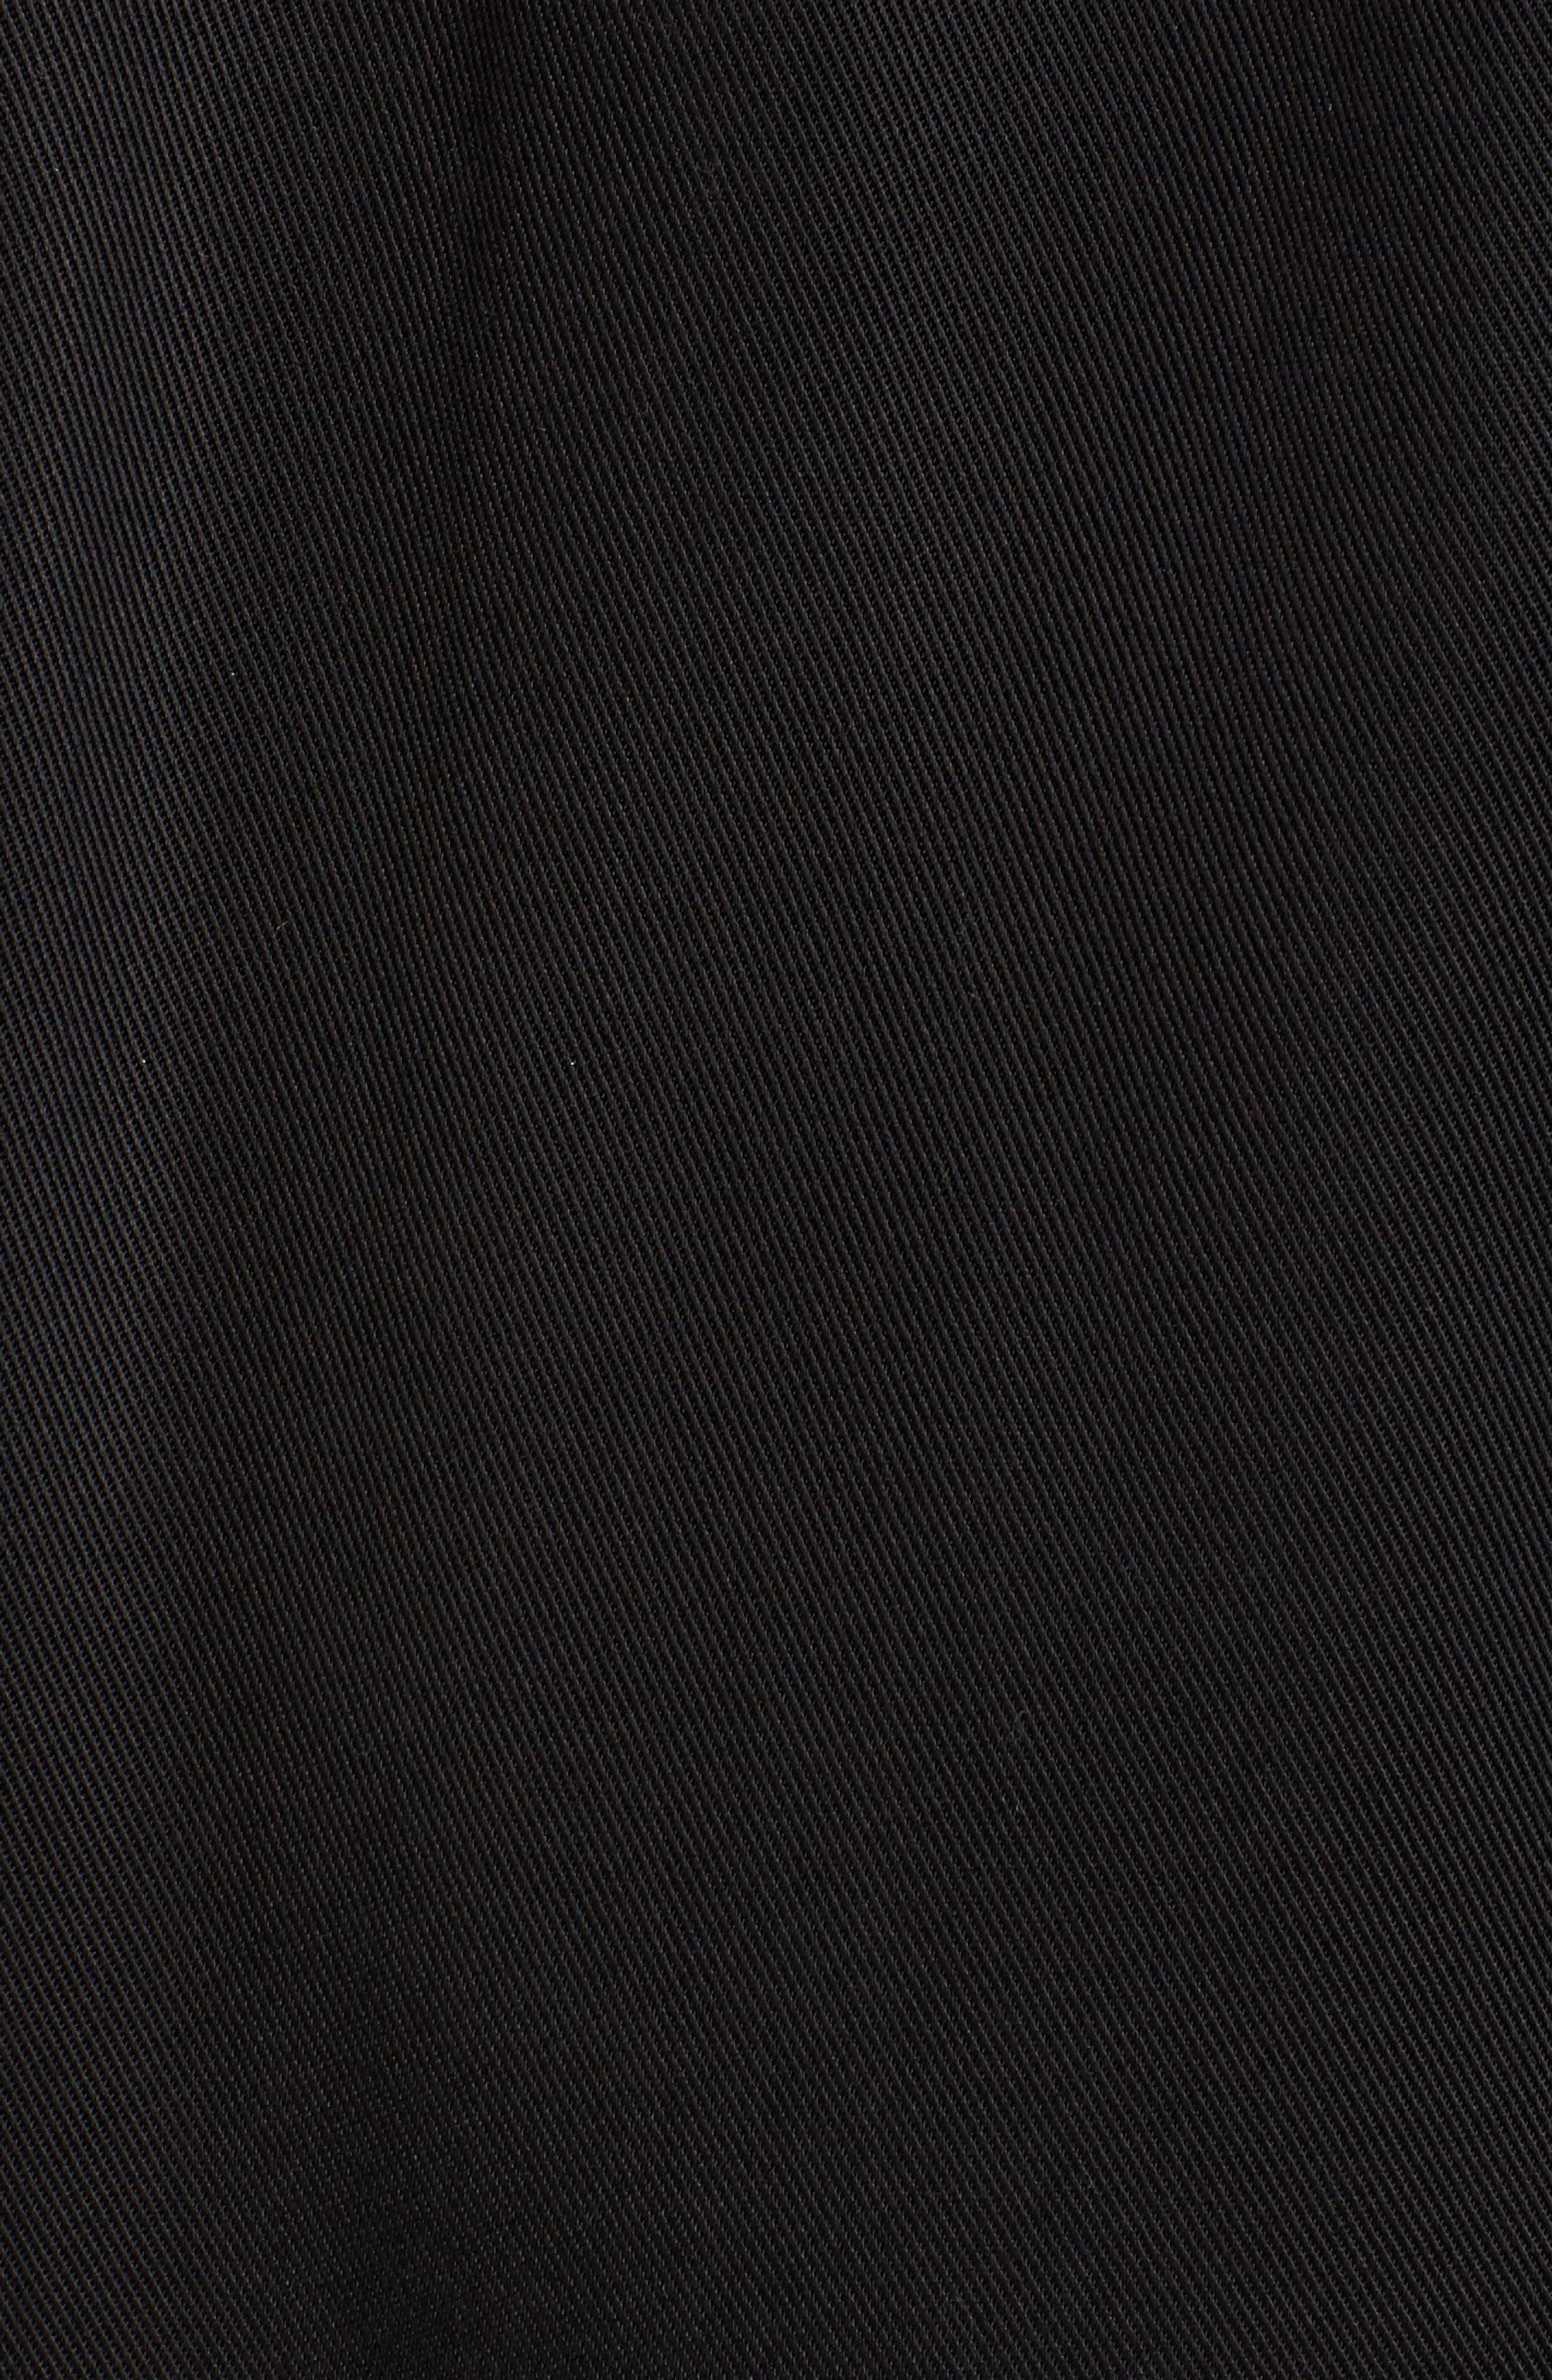 Tyler Hooded Trench Coat,                             Alternate thumbnail 6, color,                             001